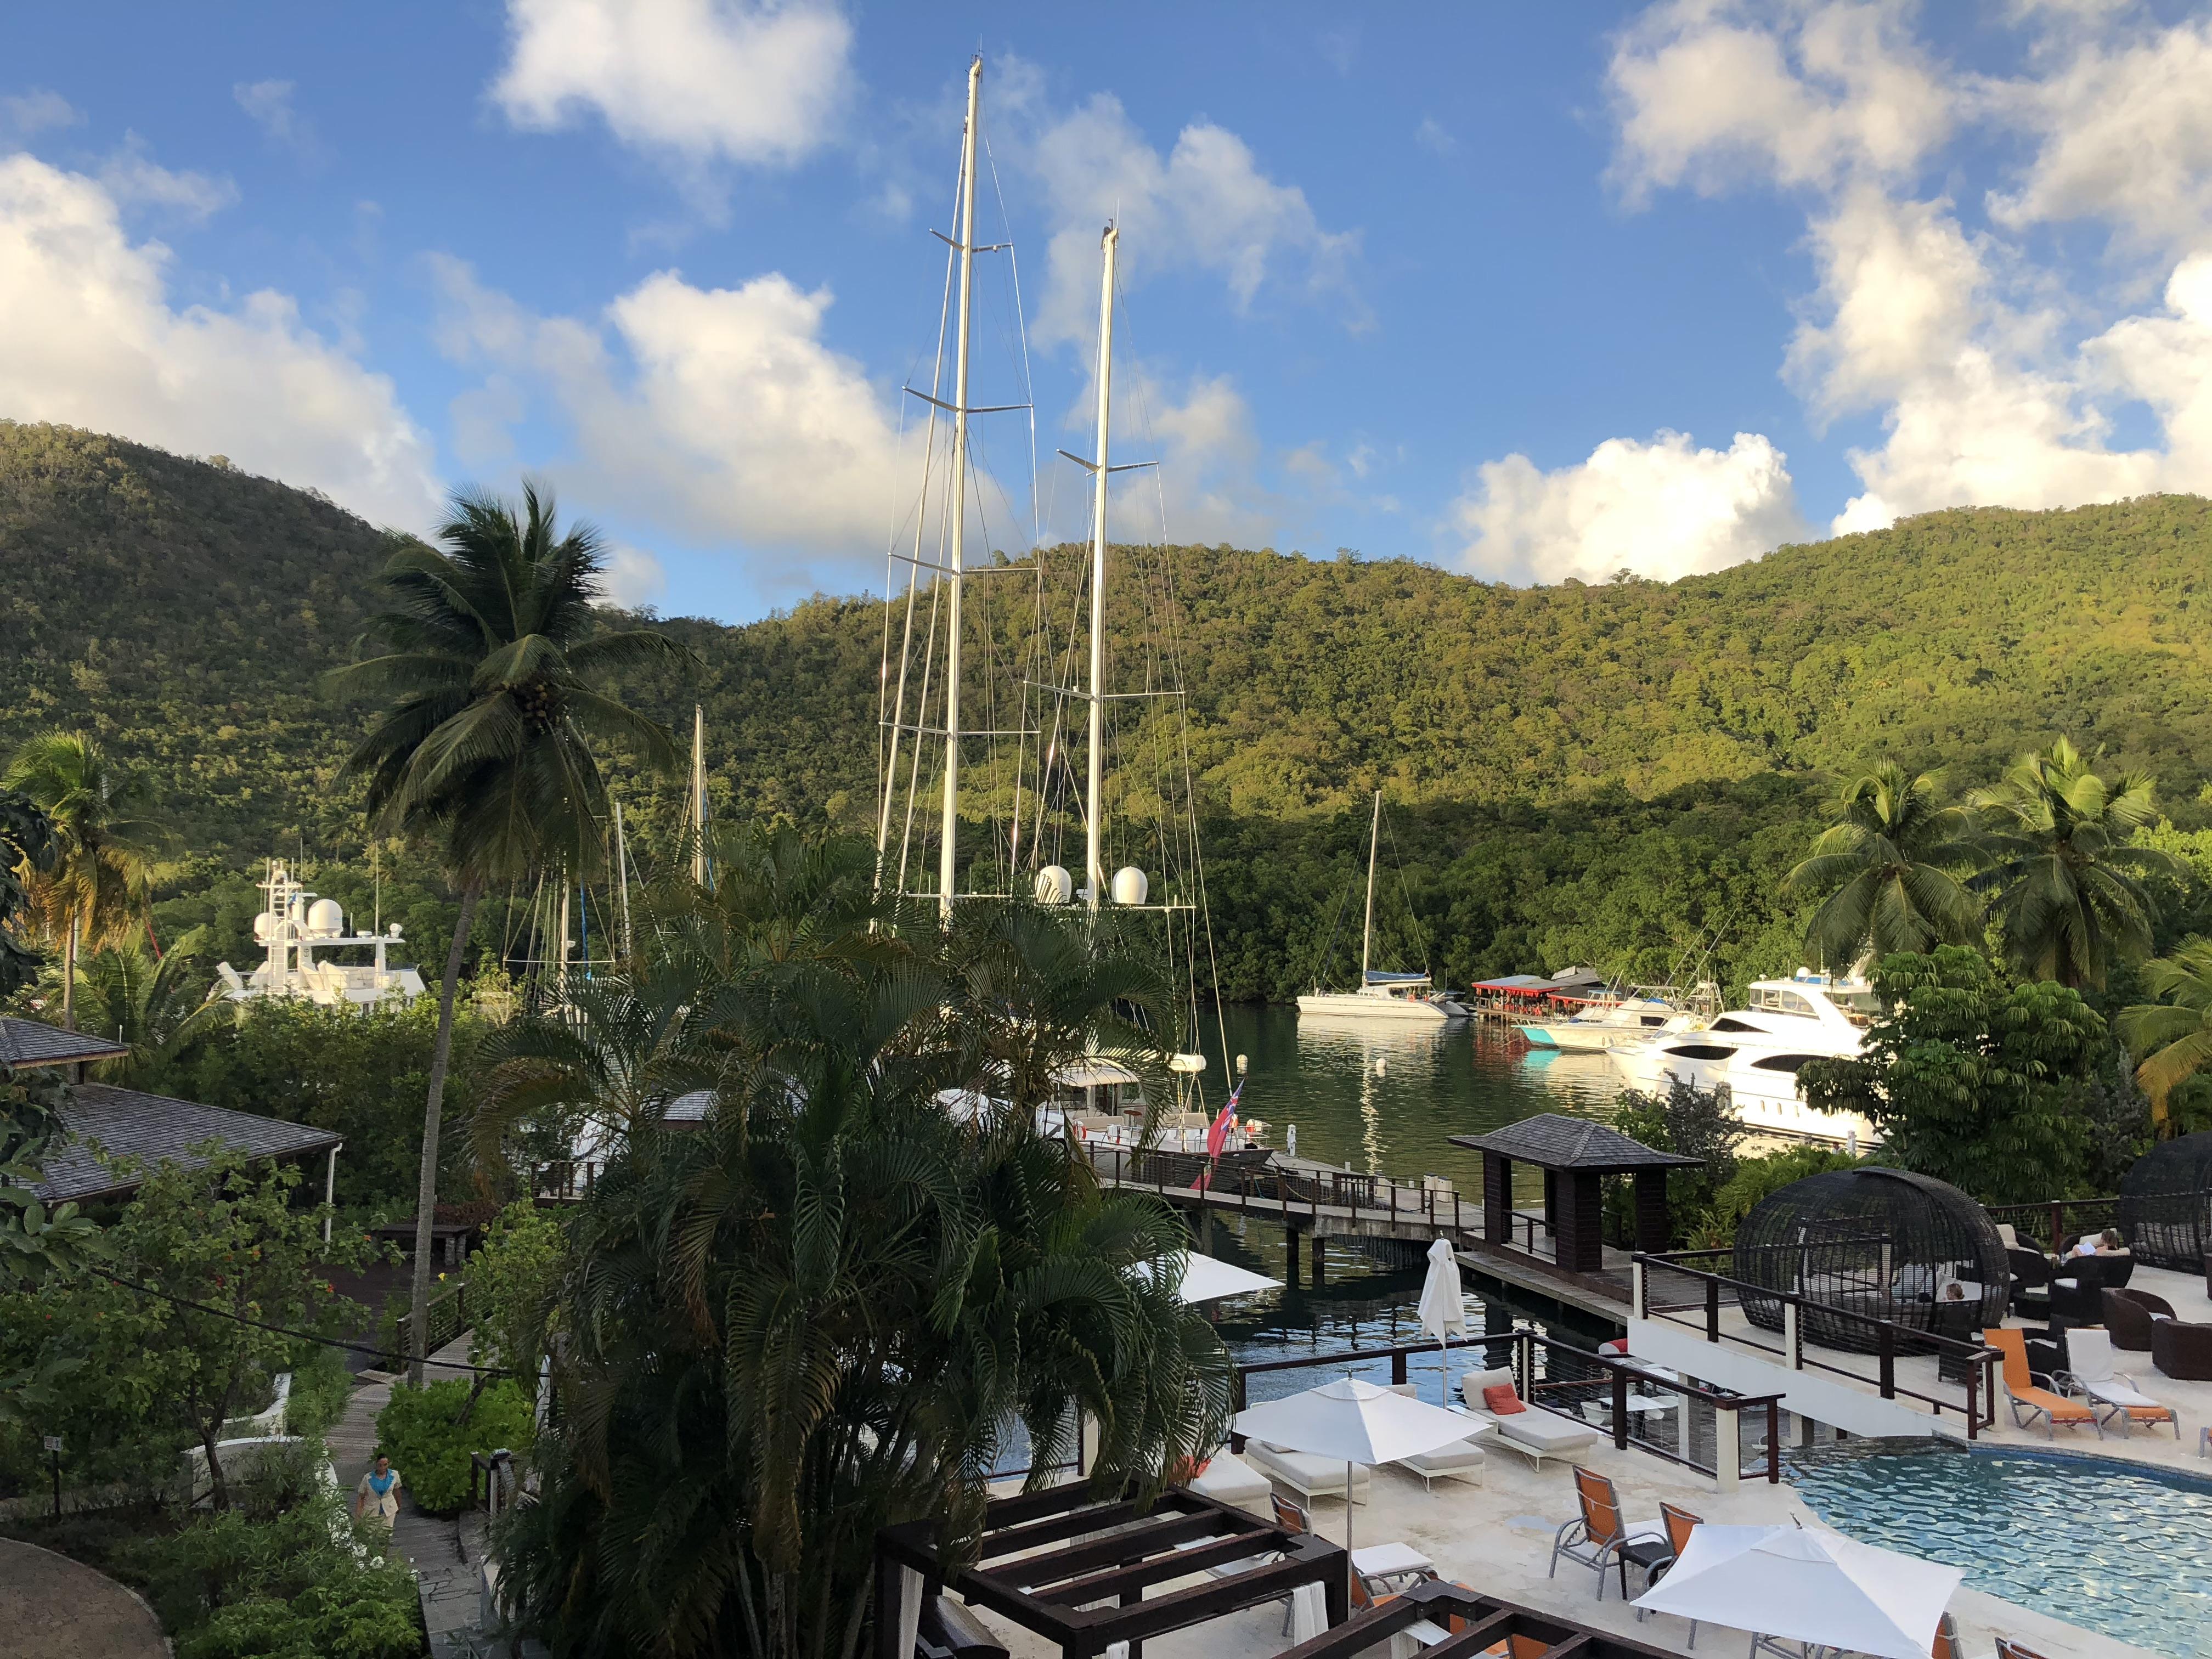 Marigot Bay View from the Marina Pool